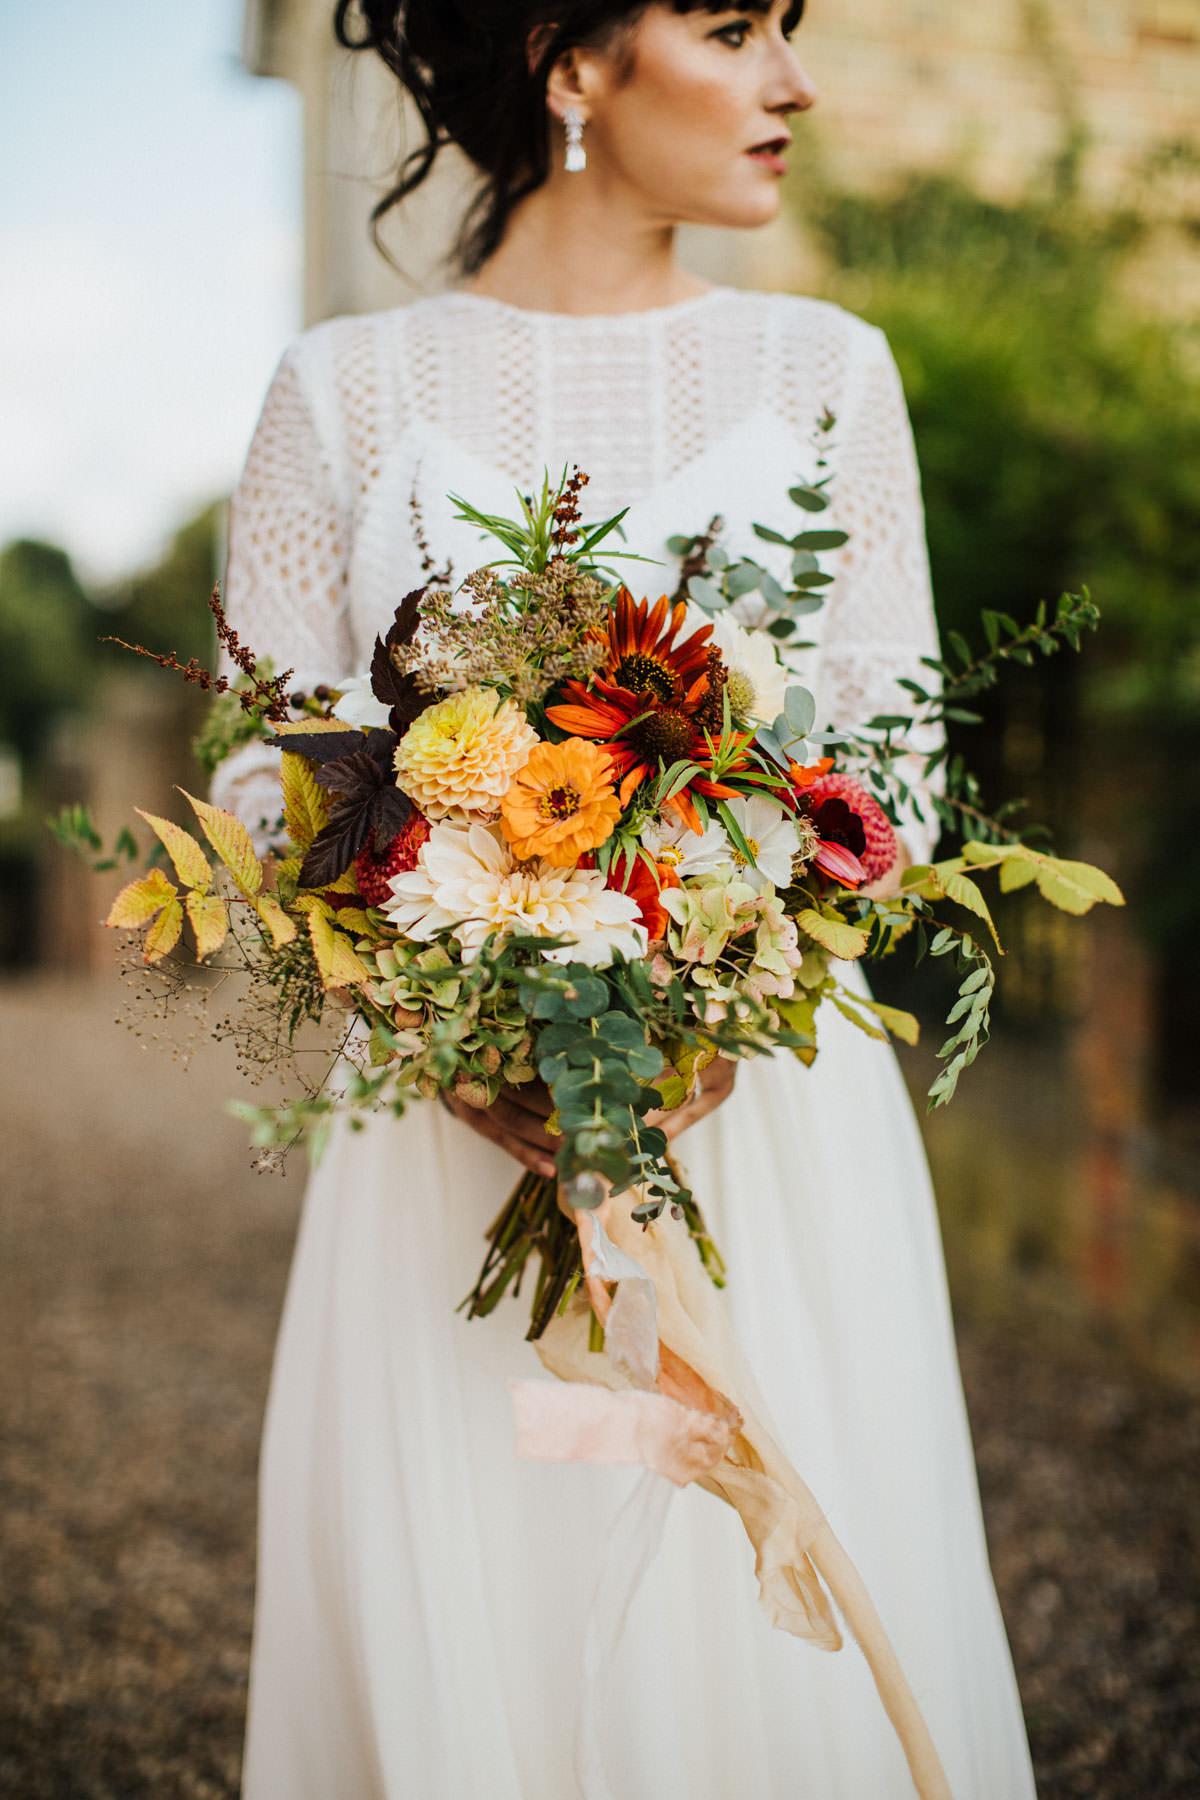 Bohemian Wedding Inspiration: Beautiful Autumnal Wedding Bouquet